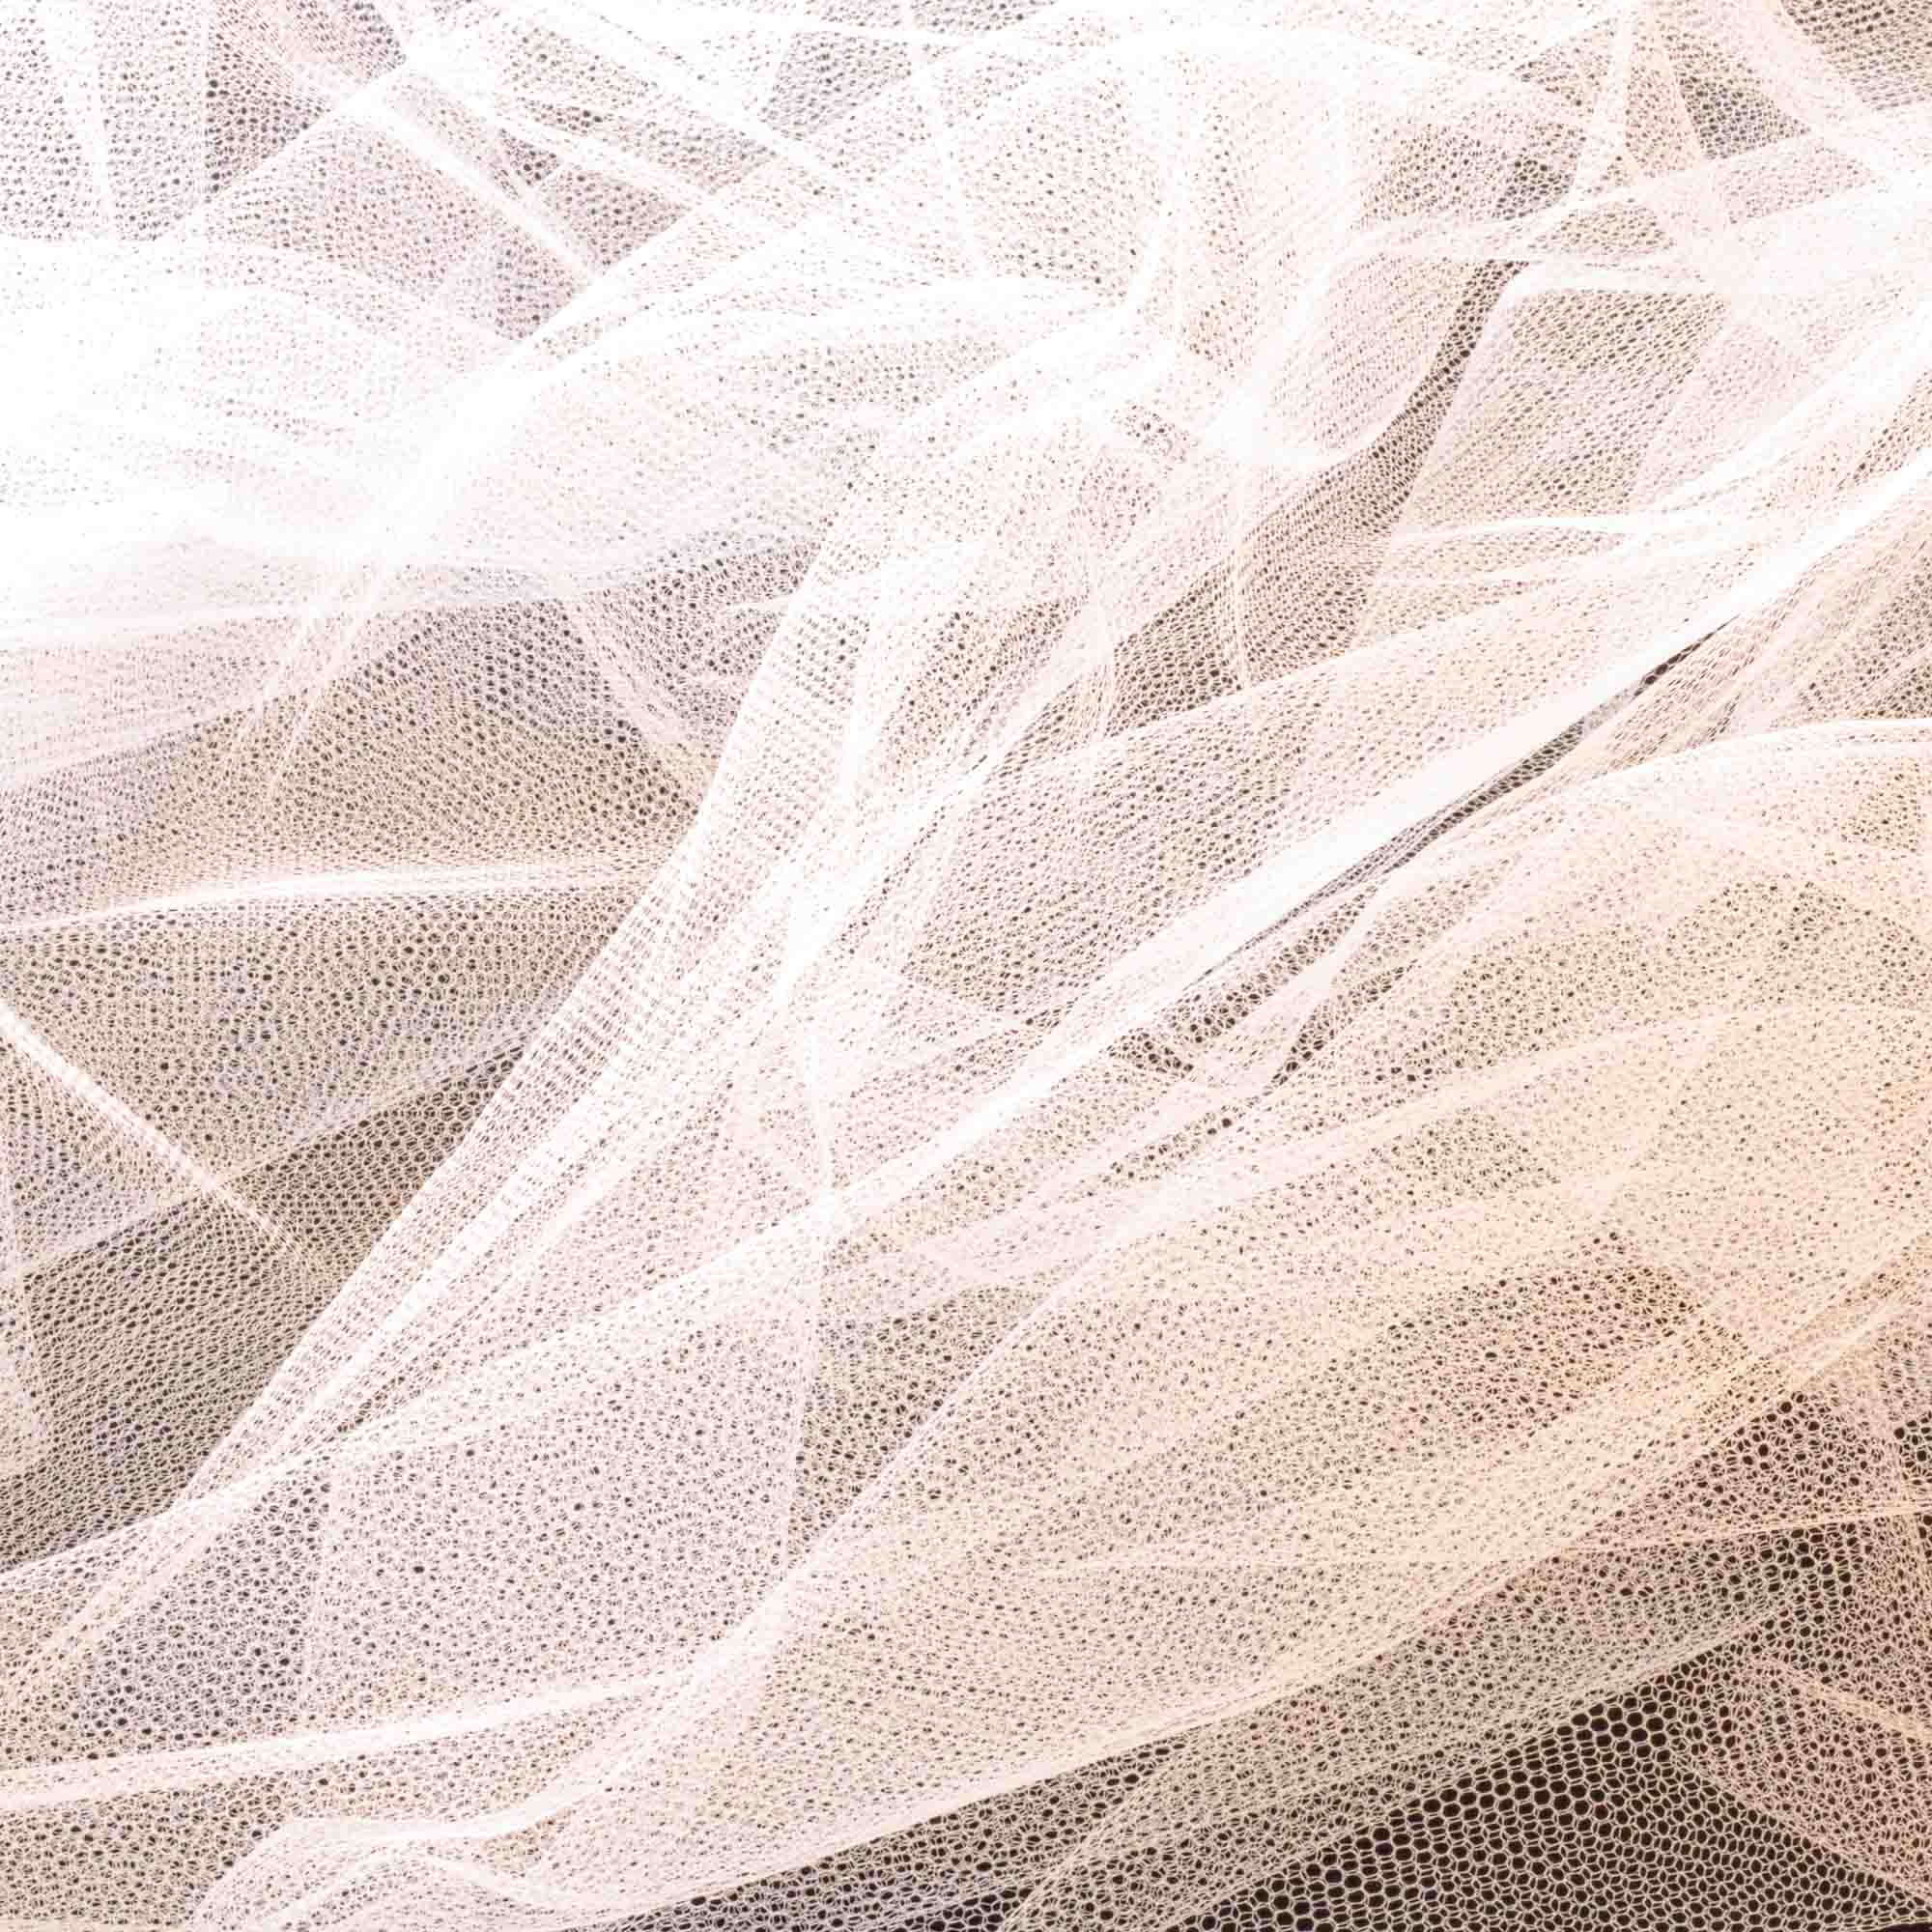 Tecido Tule Branco 100% Poliester 1,20 m Largura